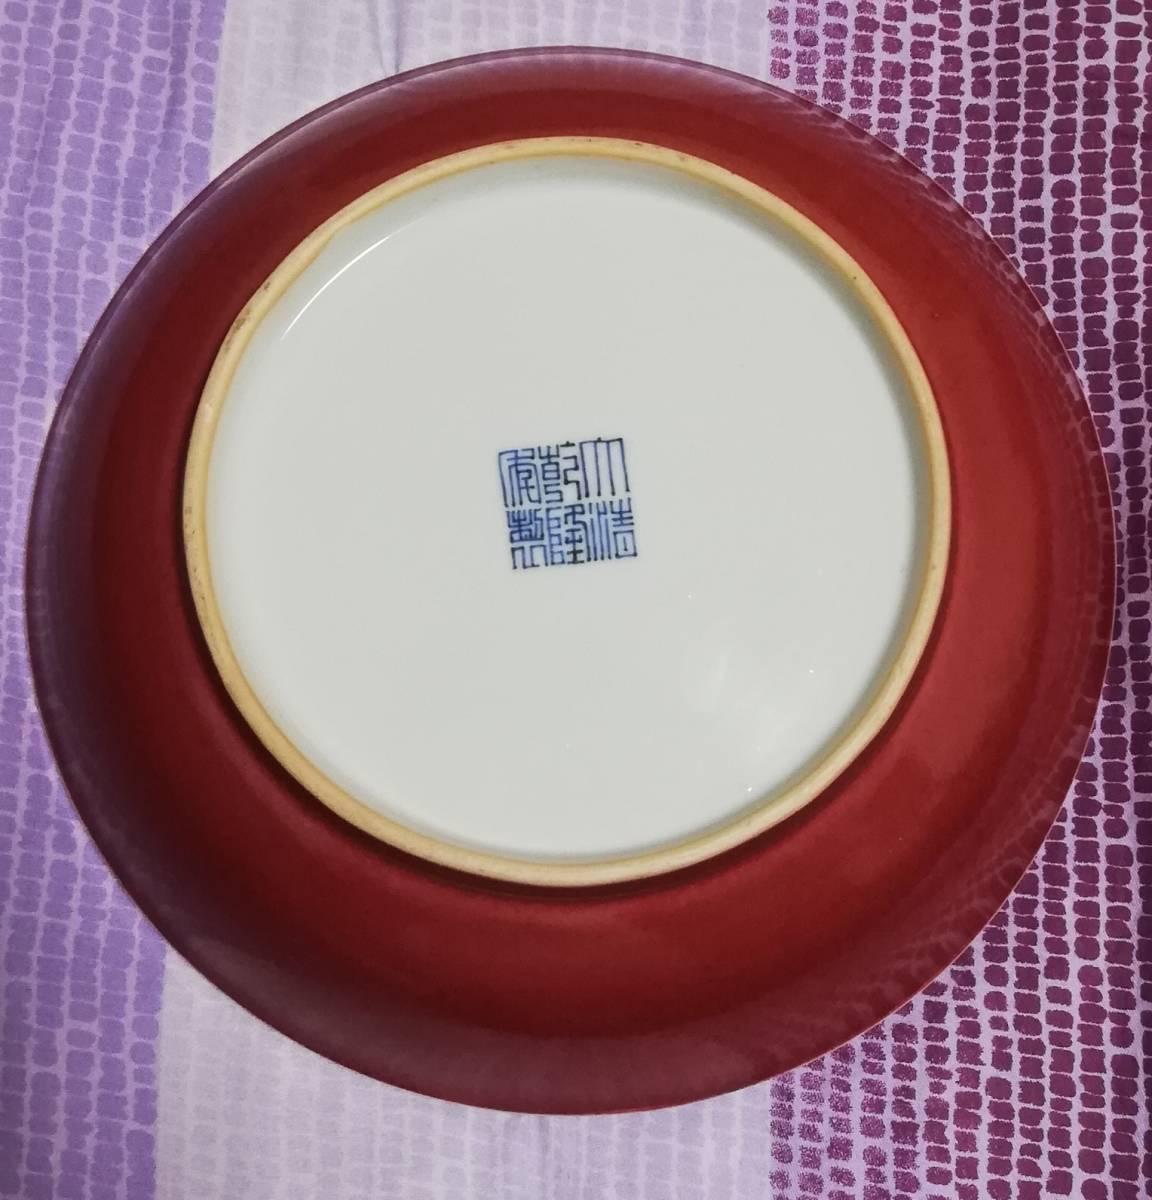 官窯 大清乾隆年製銘あり 祭紅 皿 中国 時代保証_画像9